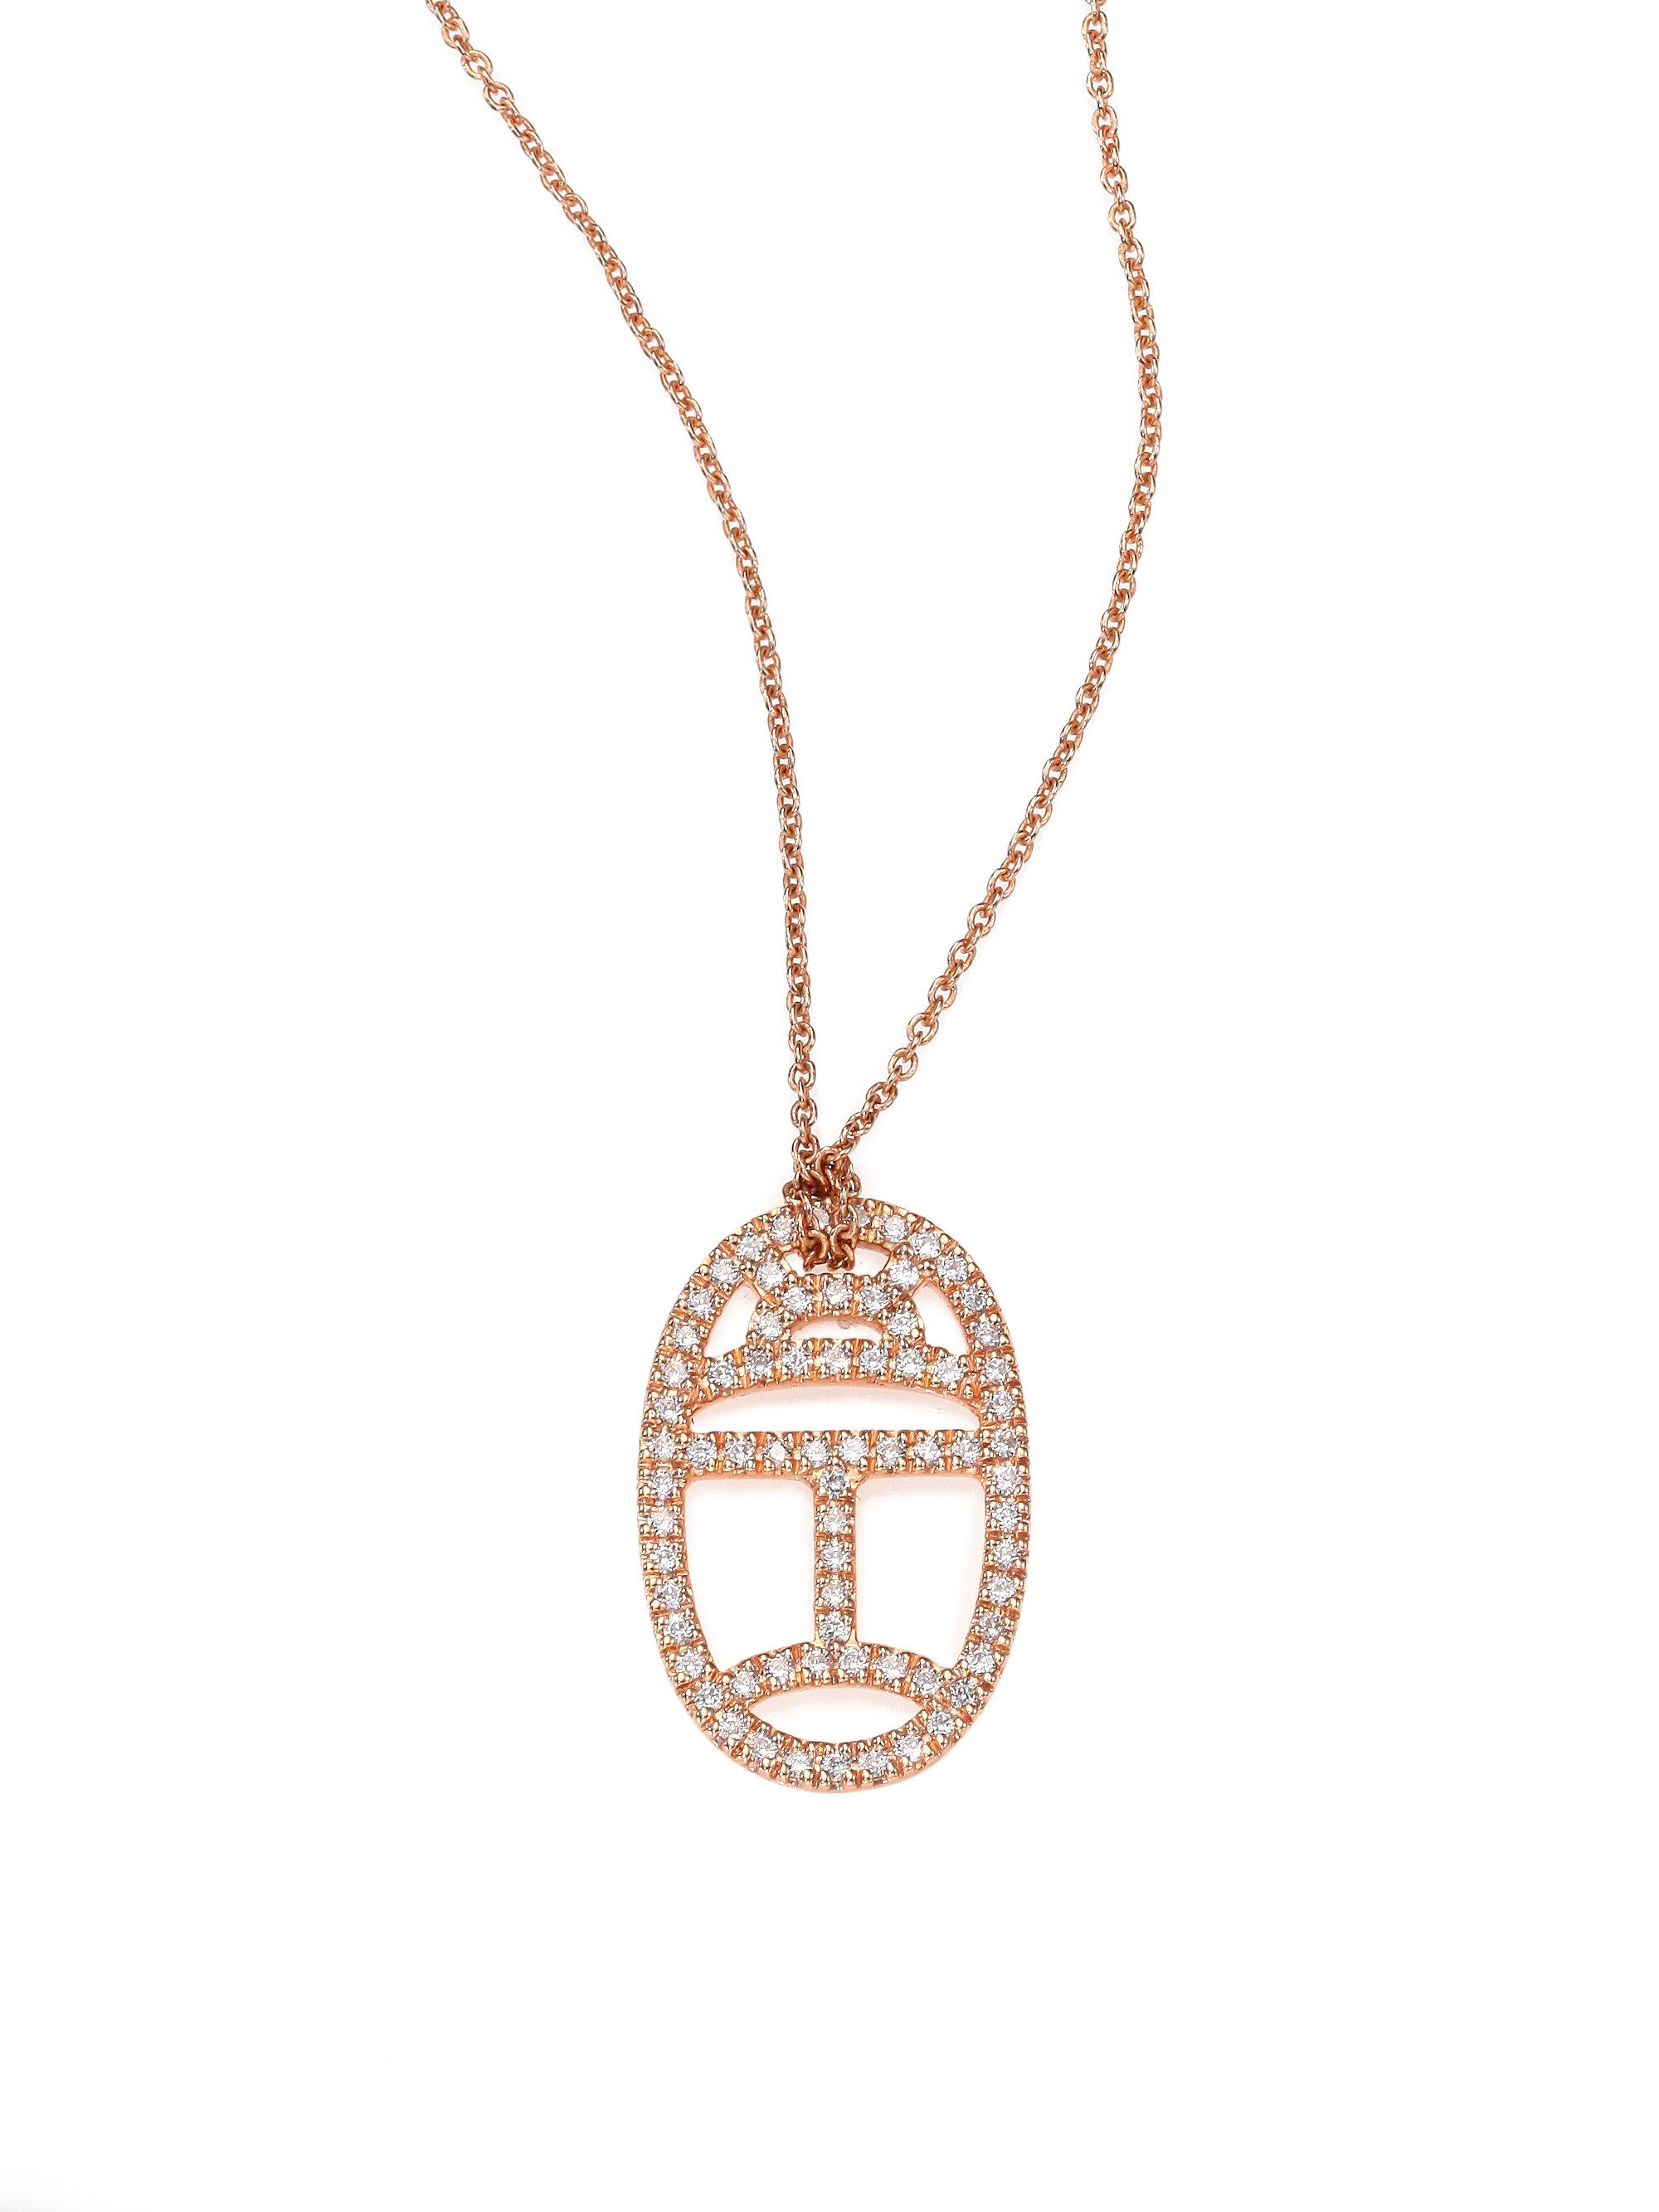 Tiny Diamond Heart Necklace in 18K Rose Gold and Diamonds Ginette NY sZo3NbTr